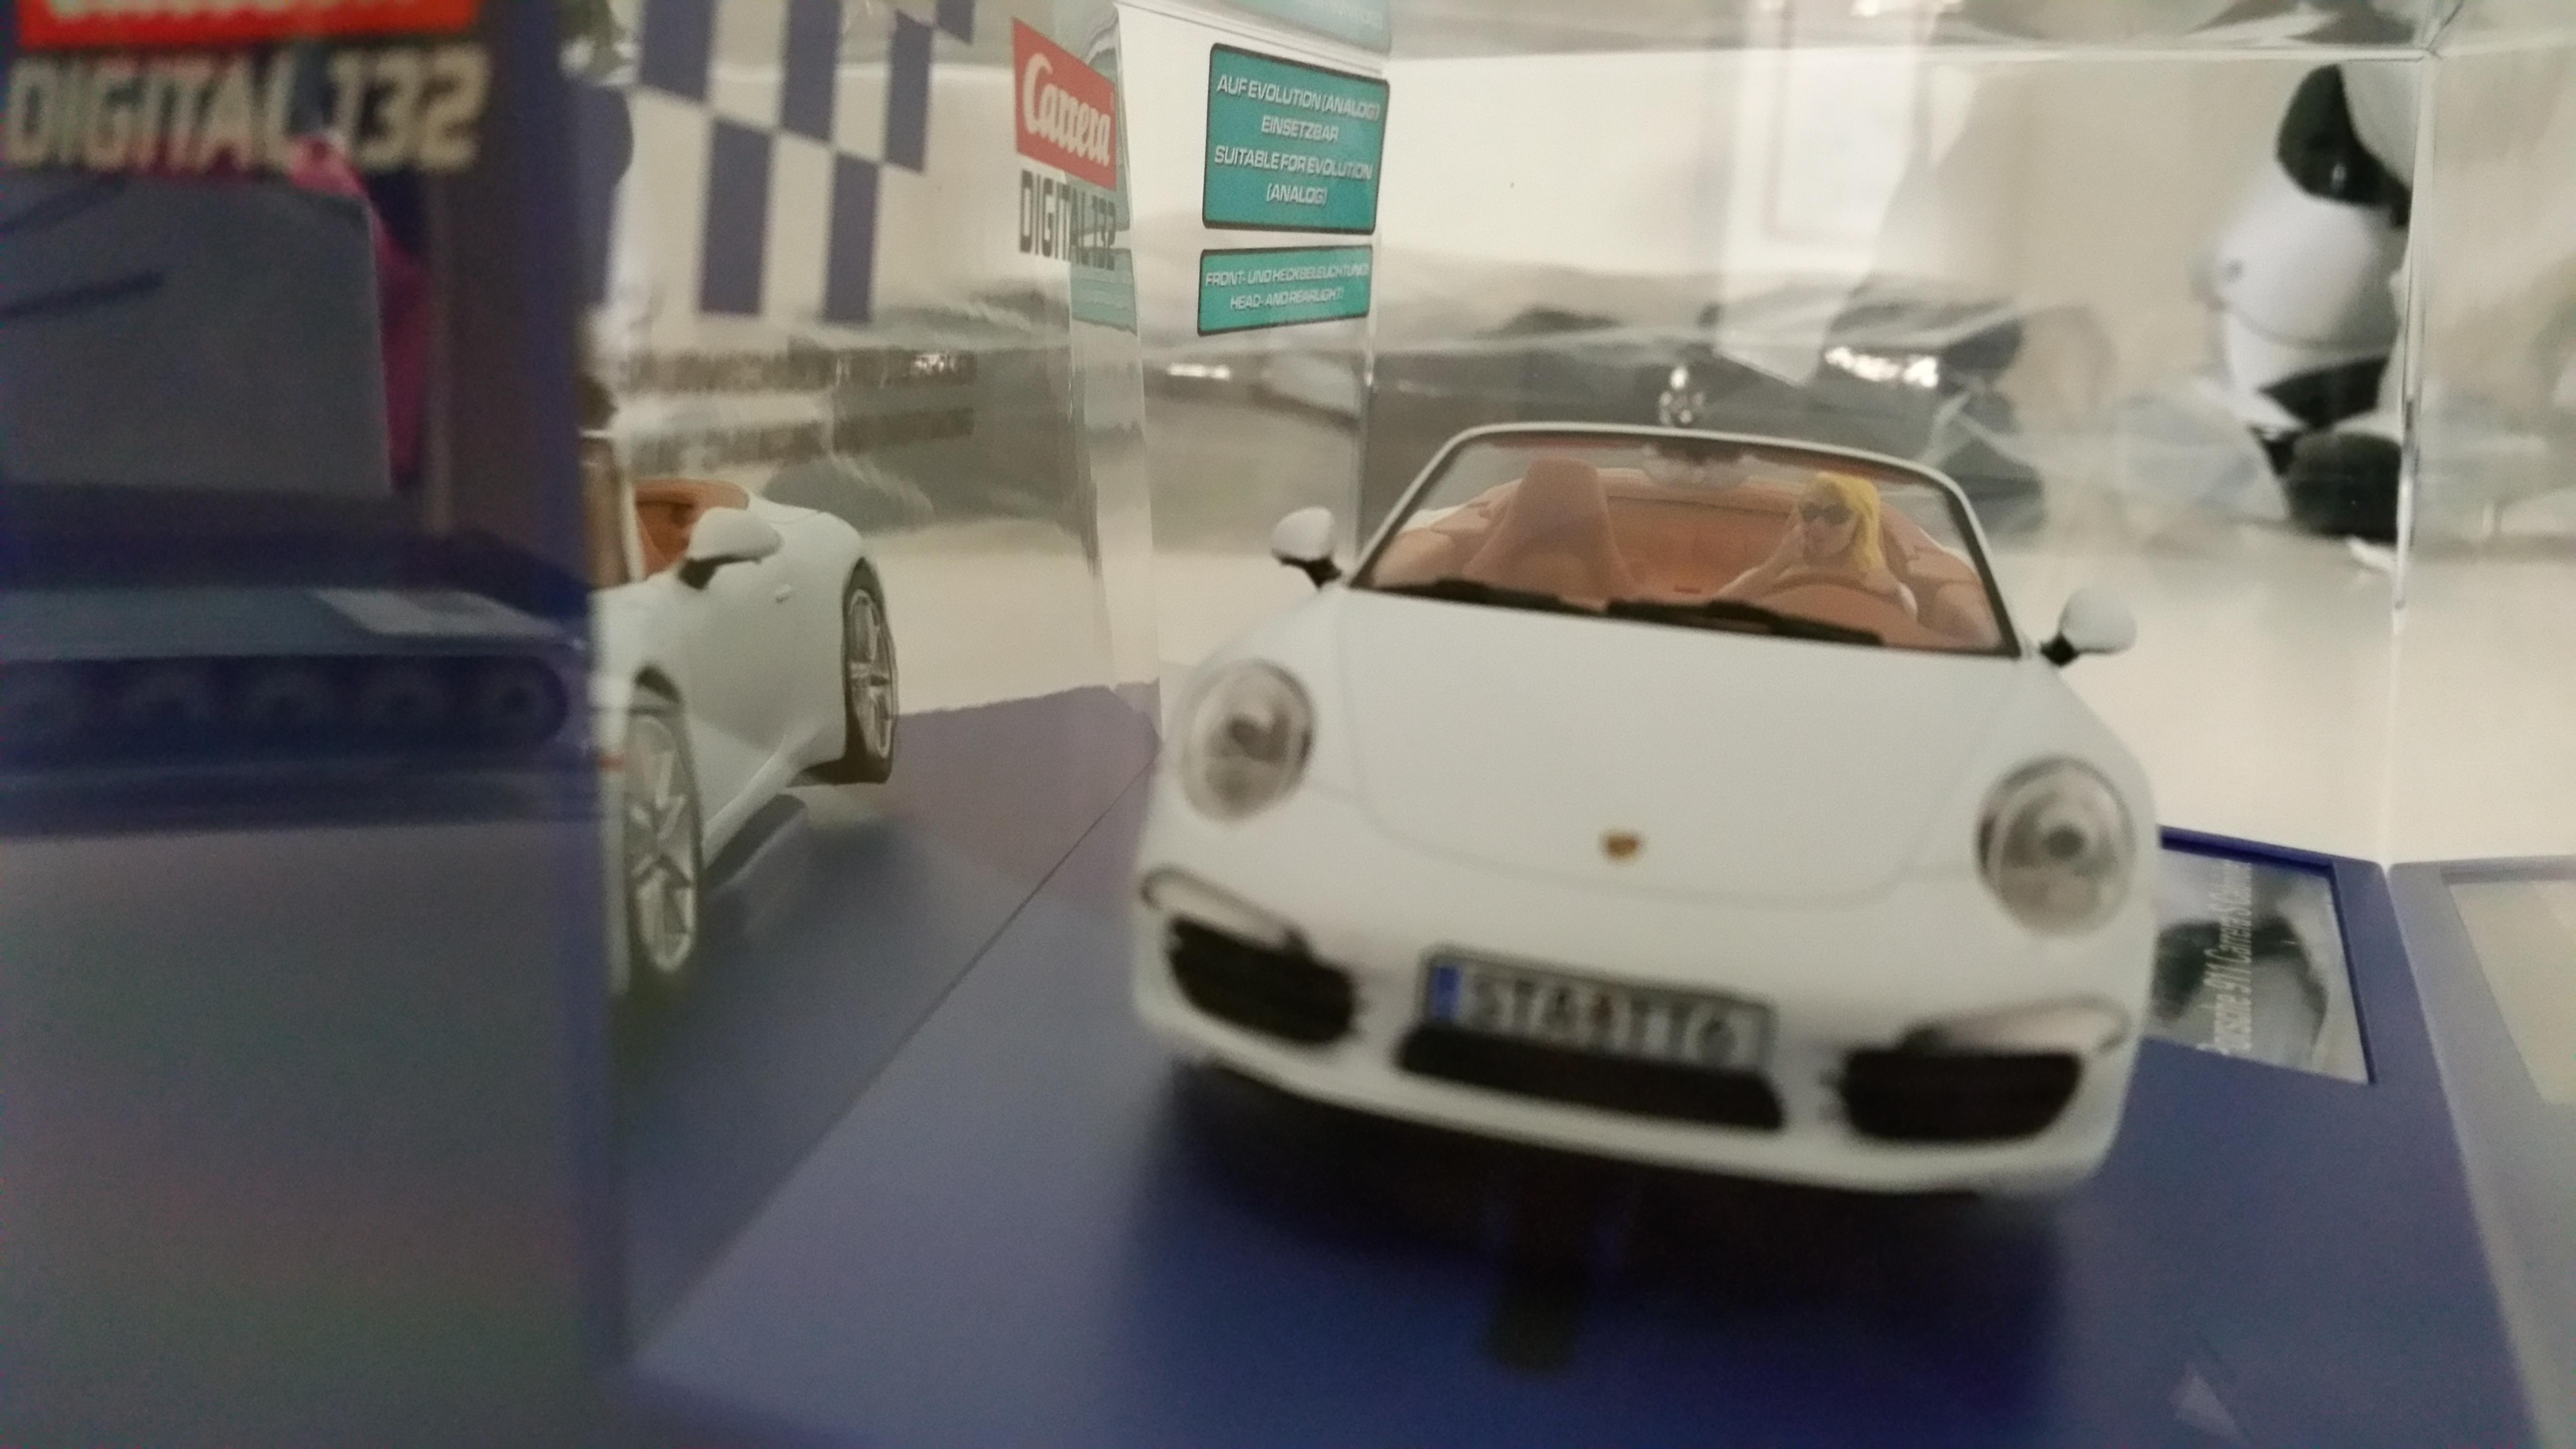 Carrera 30762 Exklusivmodell idee+spiel 2016 Porsche 911 Carrera S ...